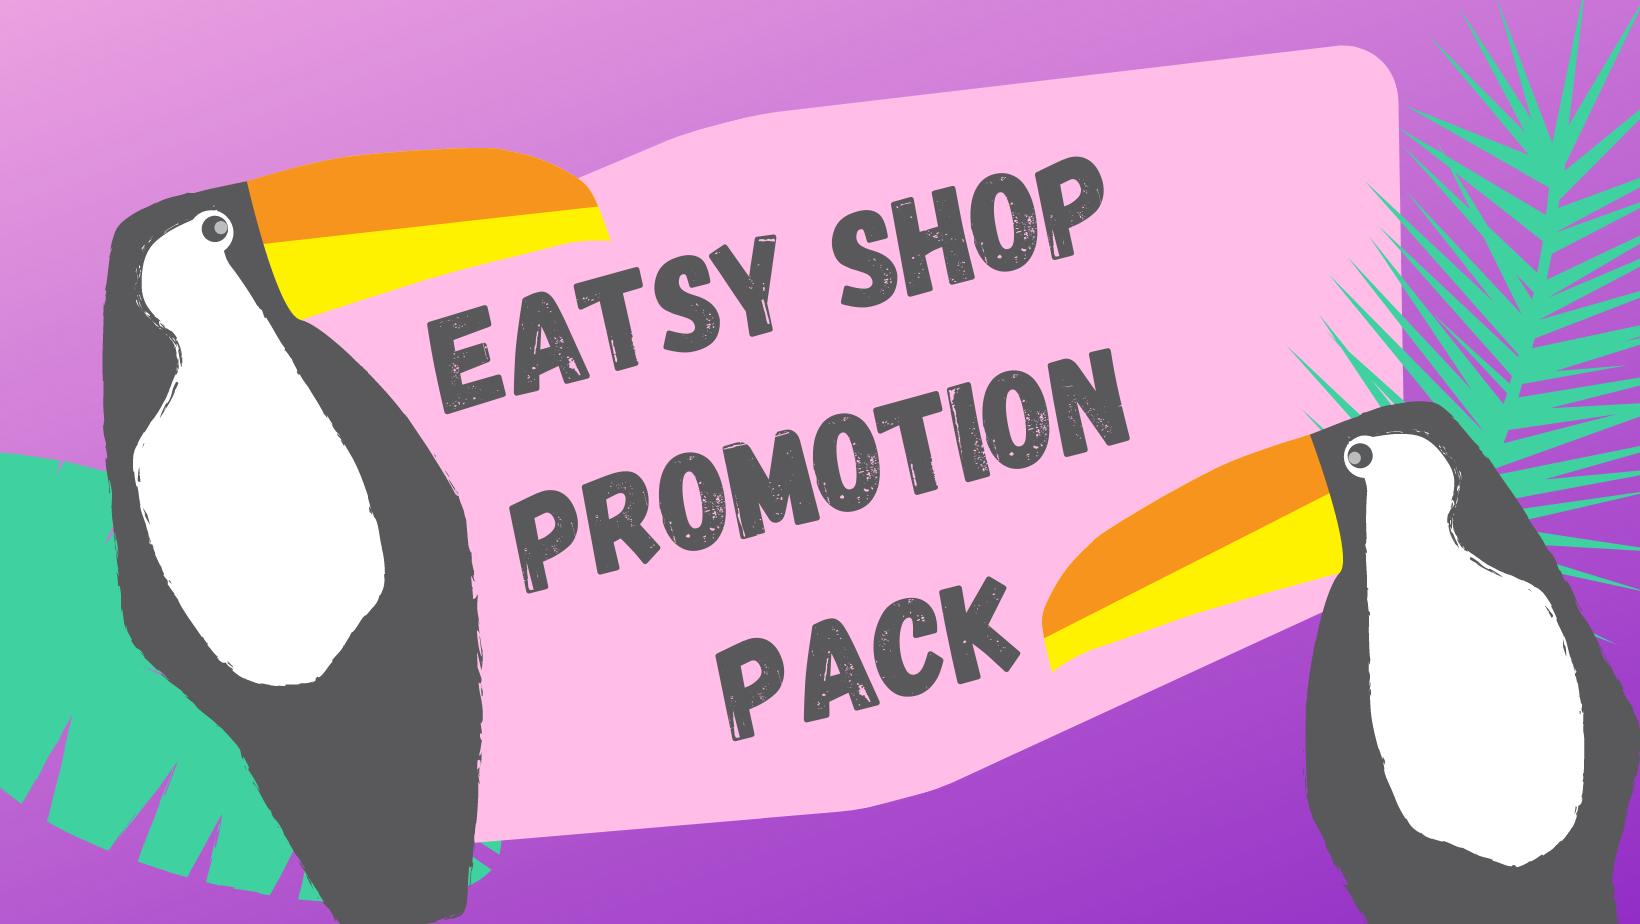 Etsy Shop Effective Promotion Pack 2021